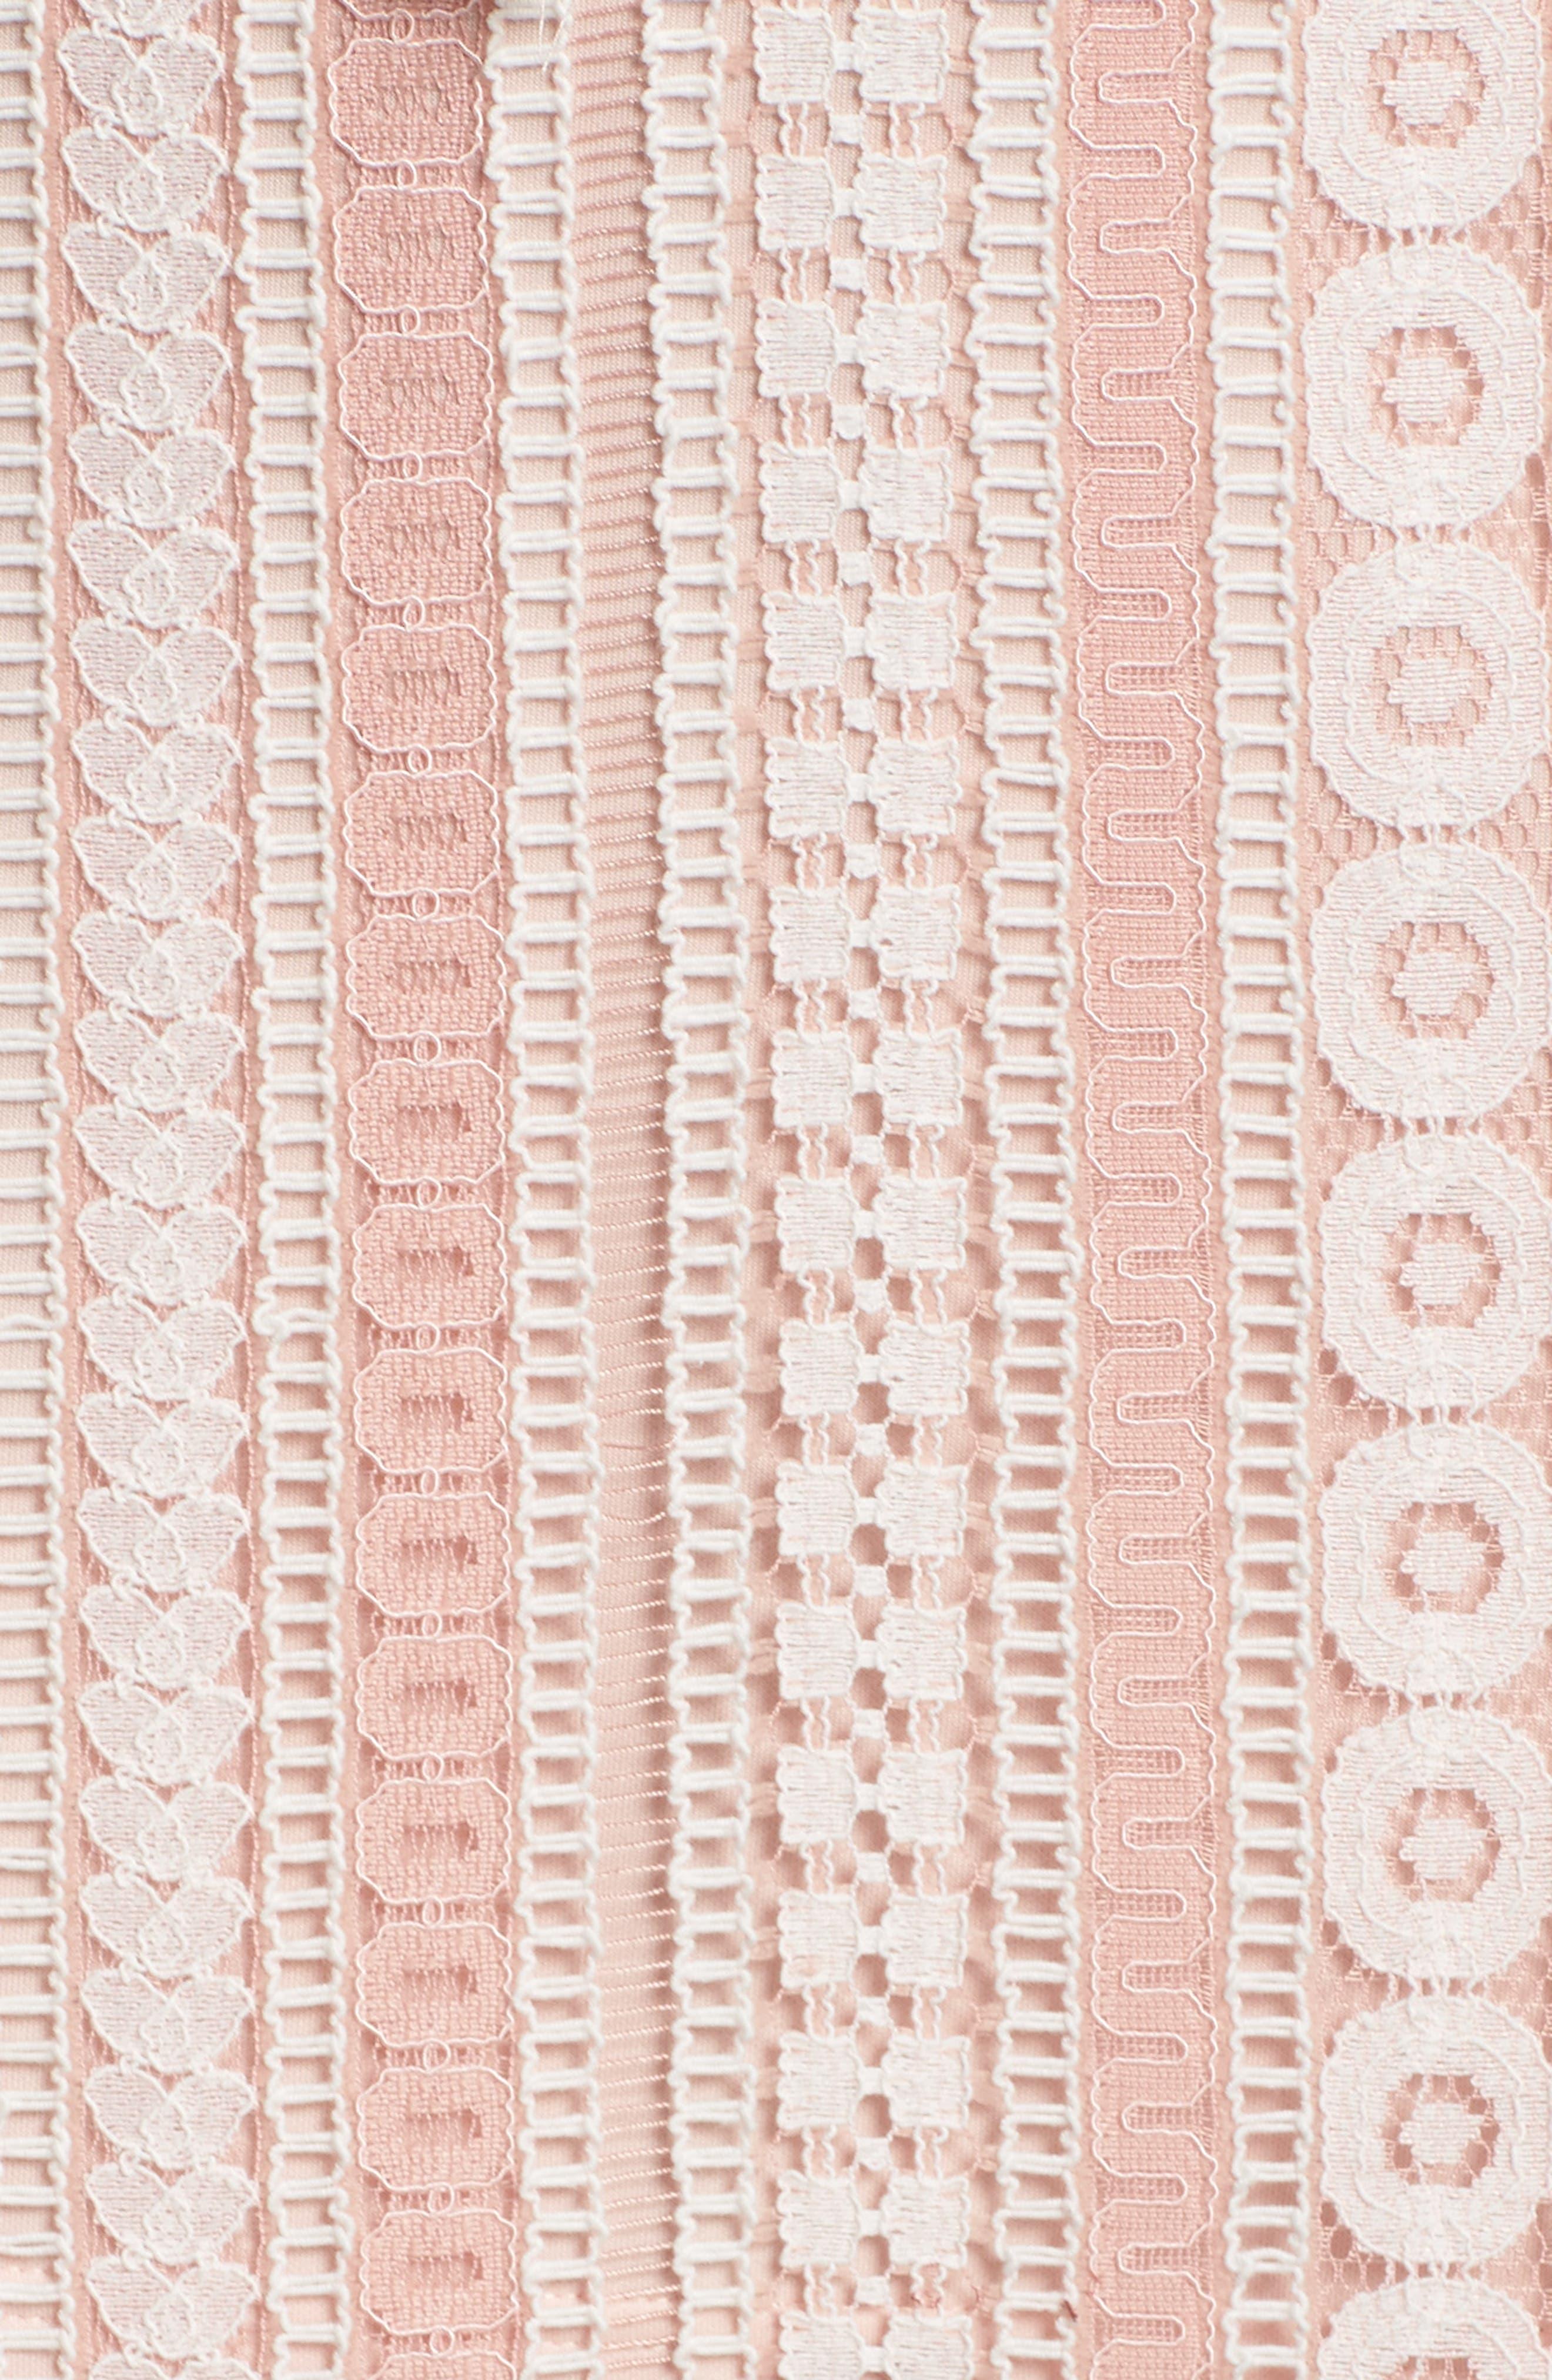 Clarinda Lace Midi Dress,                             Alternate thumbnail 5, color,                             Pink